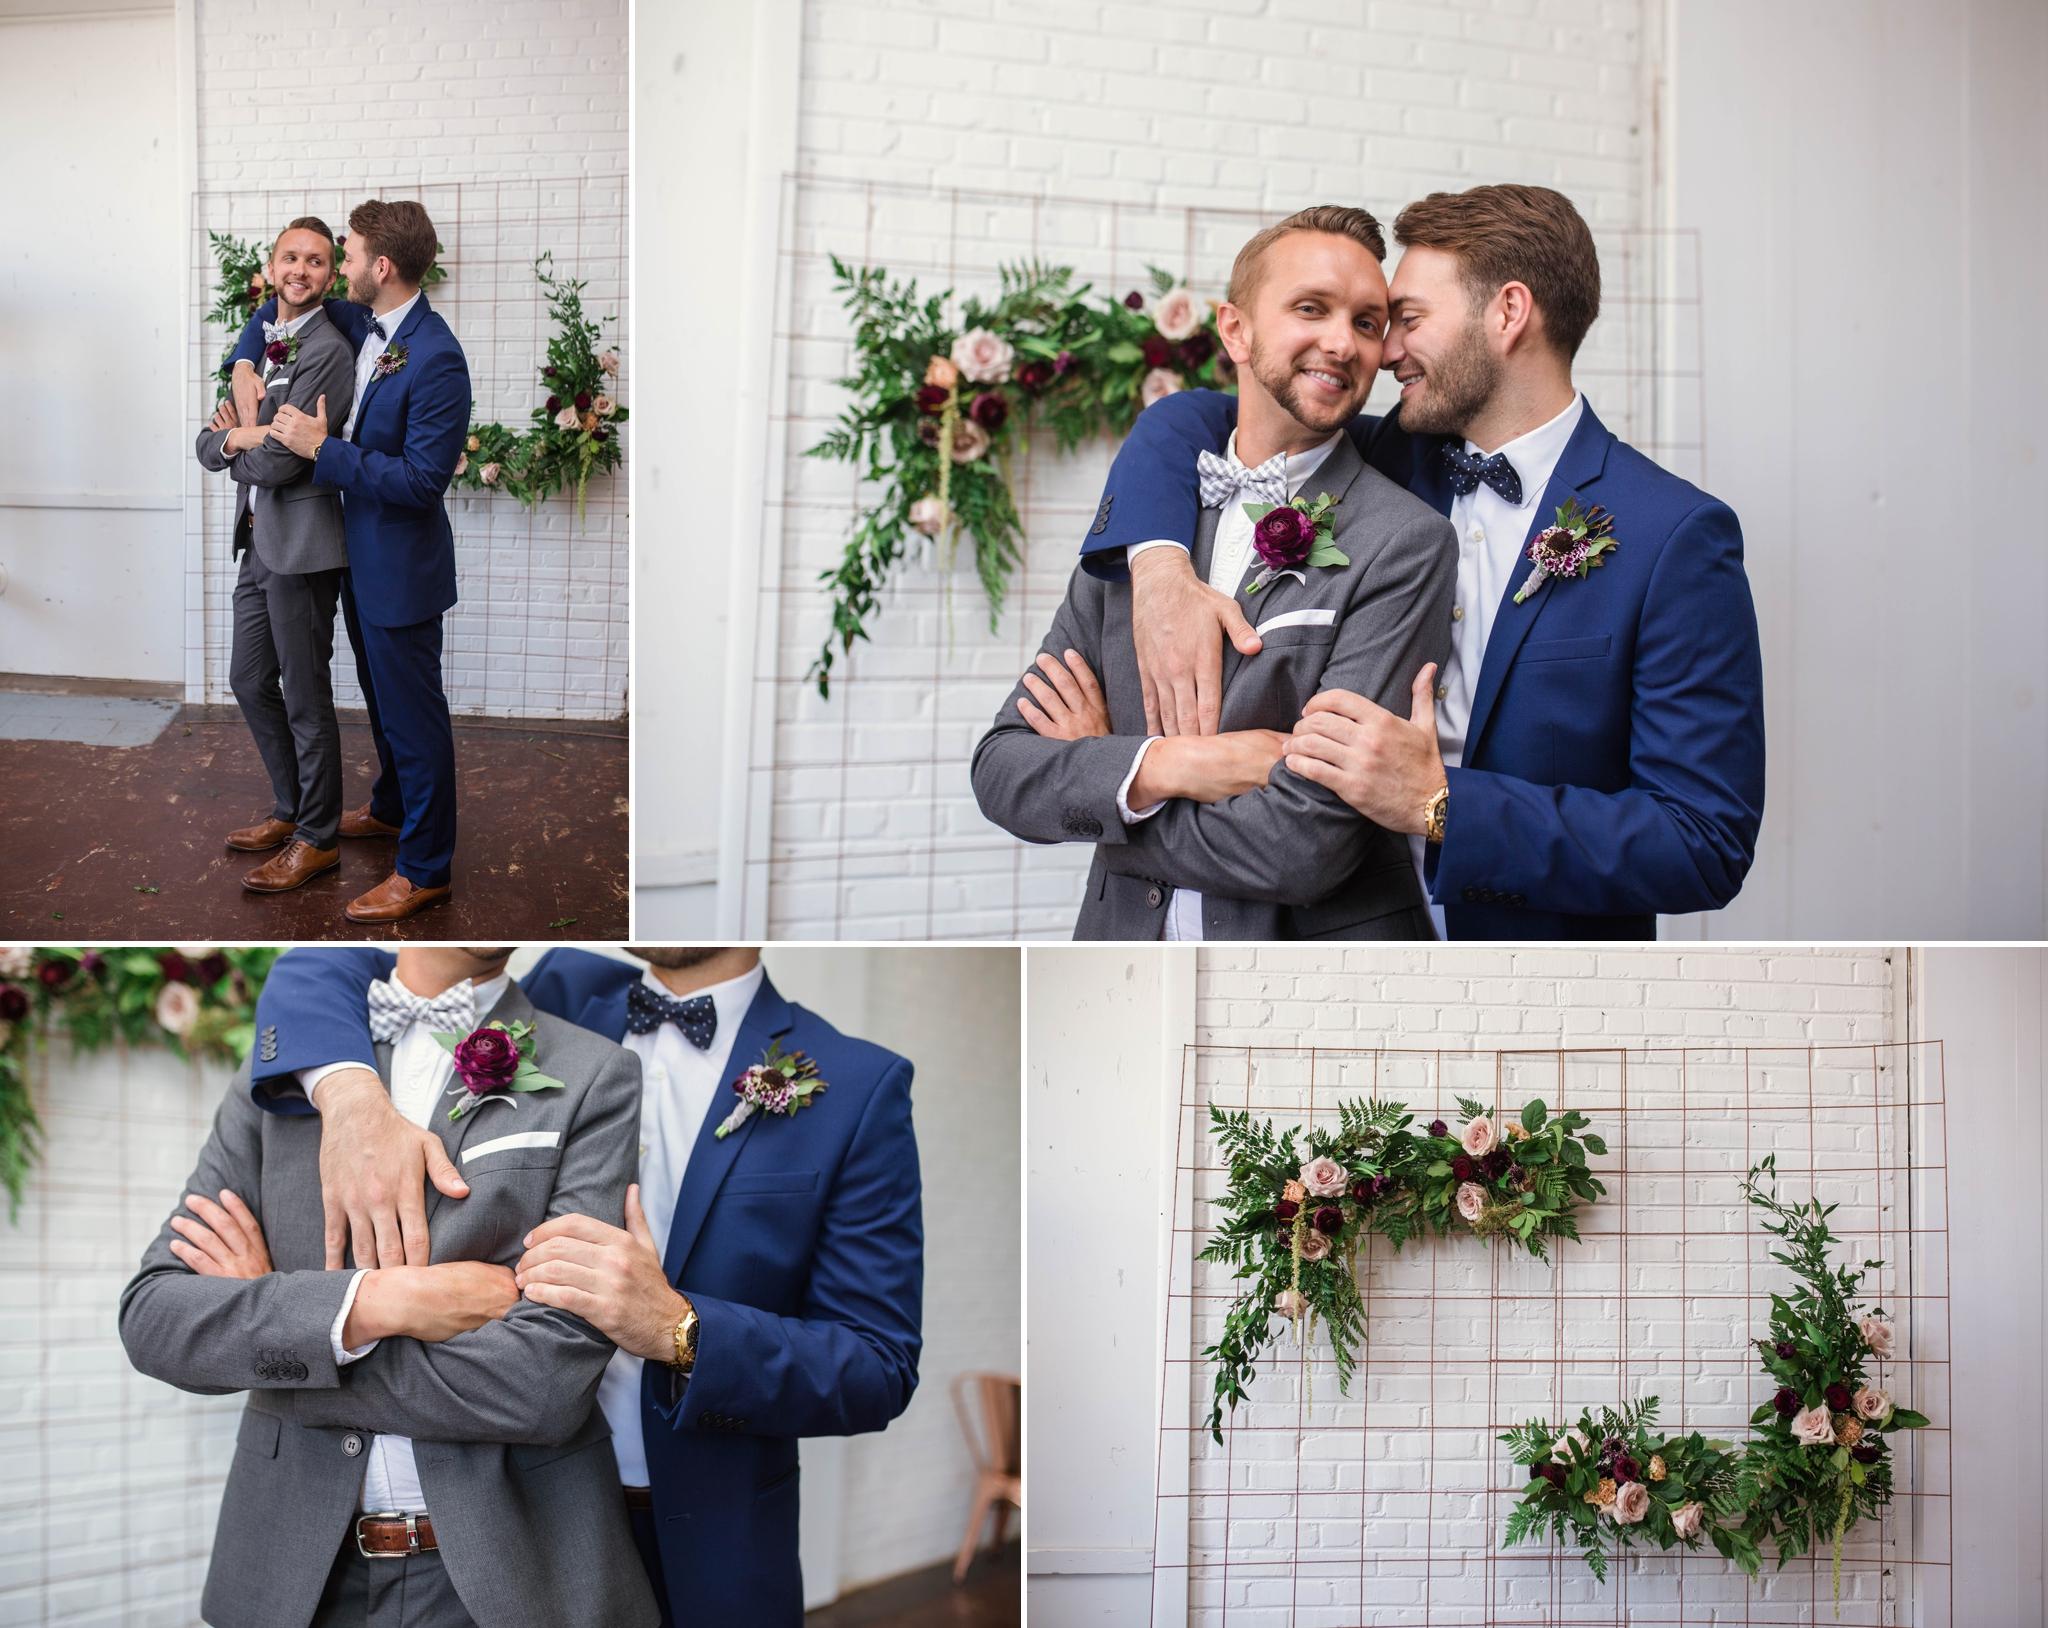 Gay and Lesbian friendly Wedding Photographer in Raleigh North Carolina - Johanna Dye Photography 12.jpg